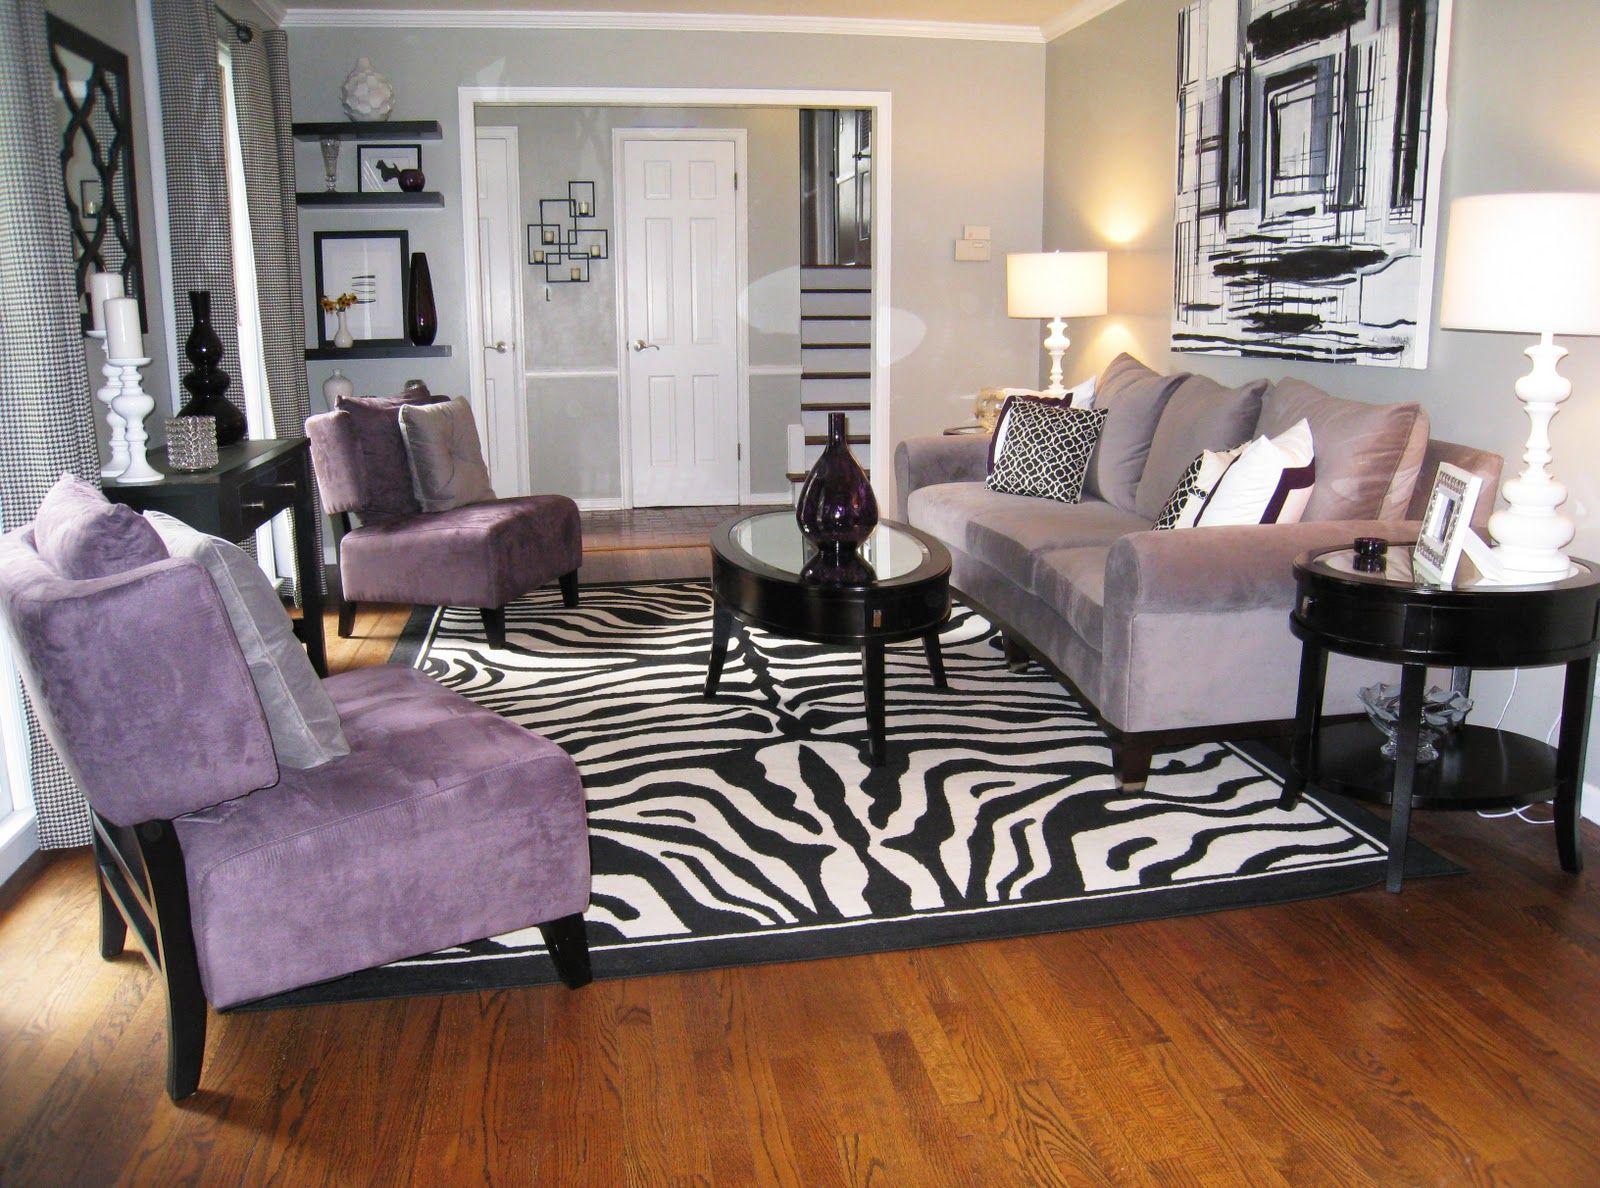 Zebra Print Rug Accessorized Shelving In The Corner Colors